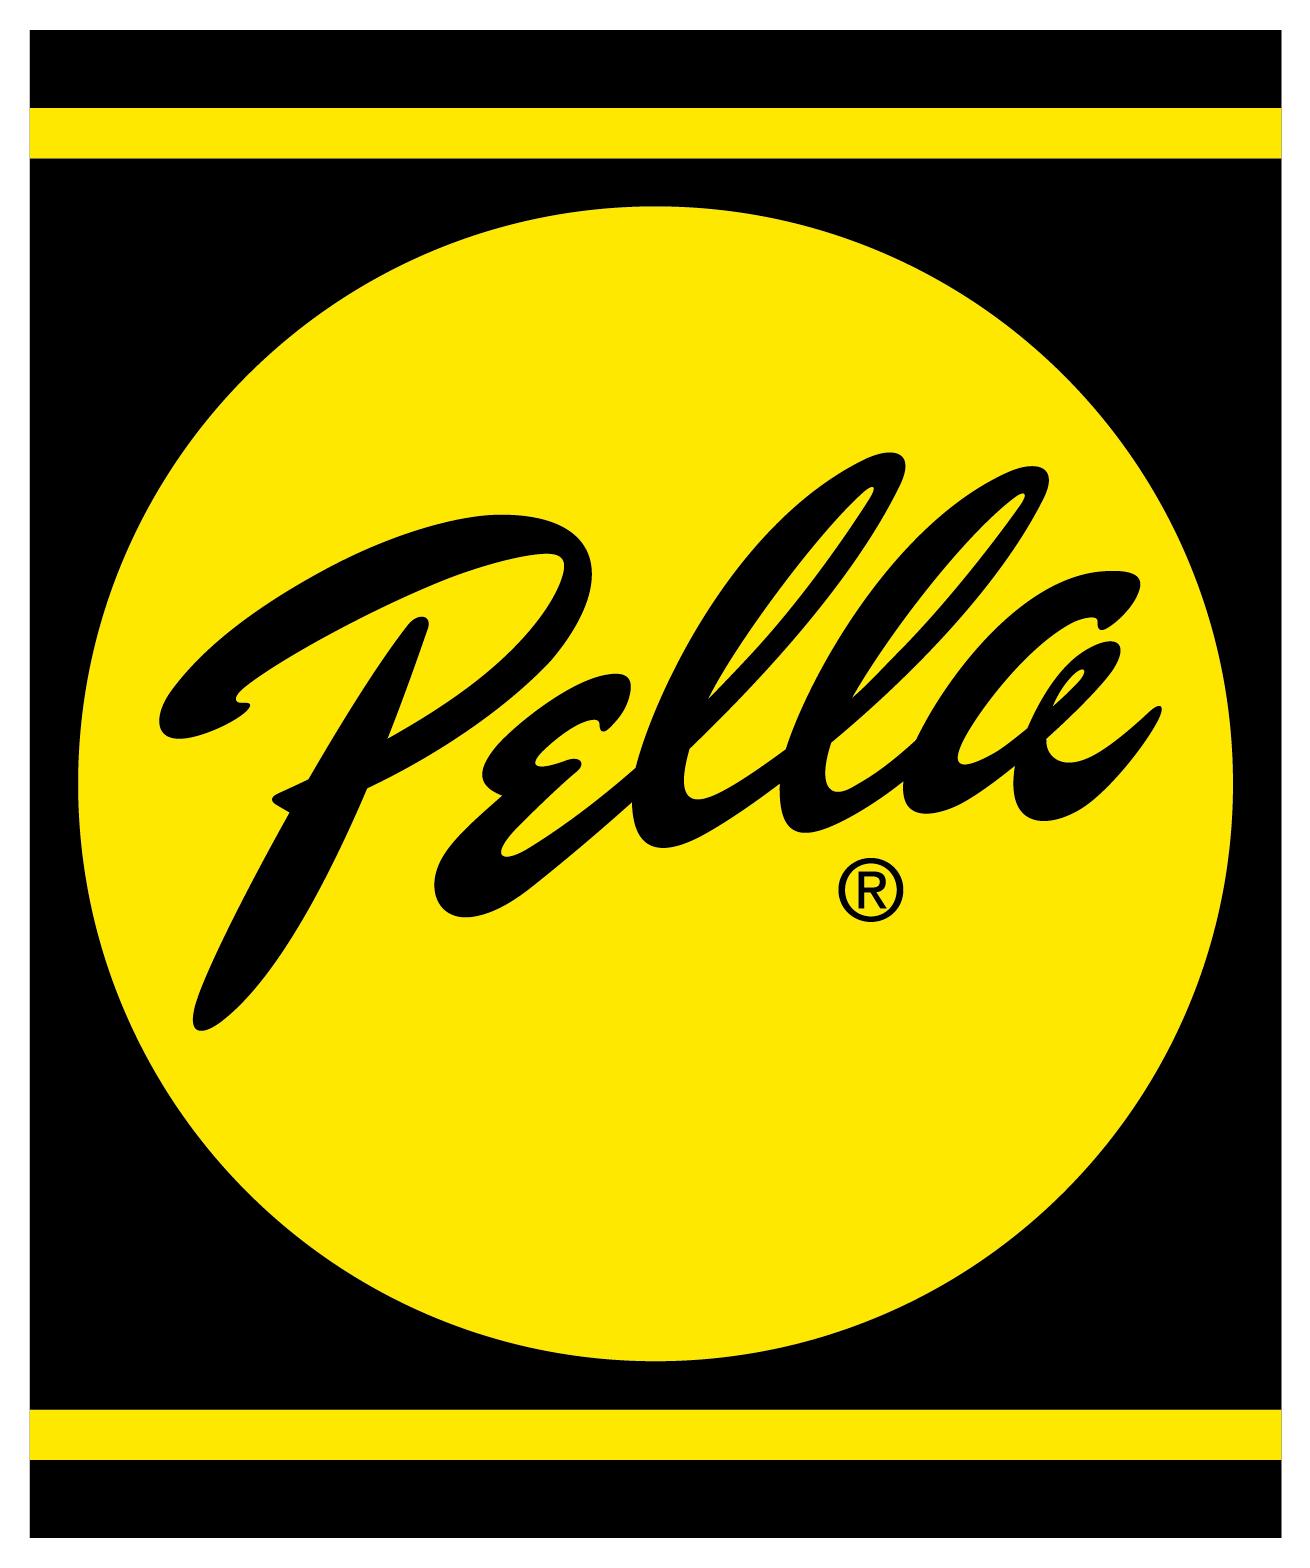 VISION House Epcot Pella